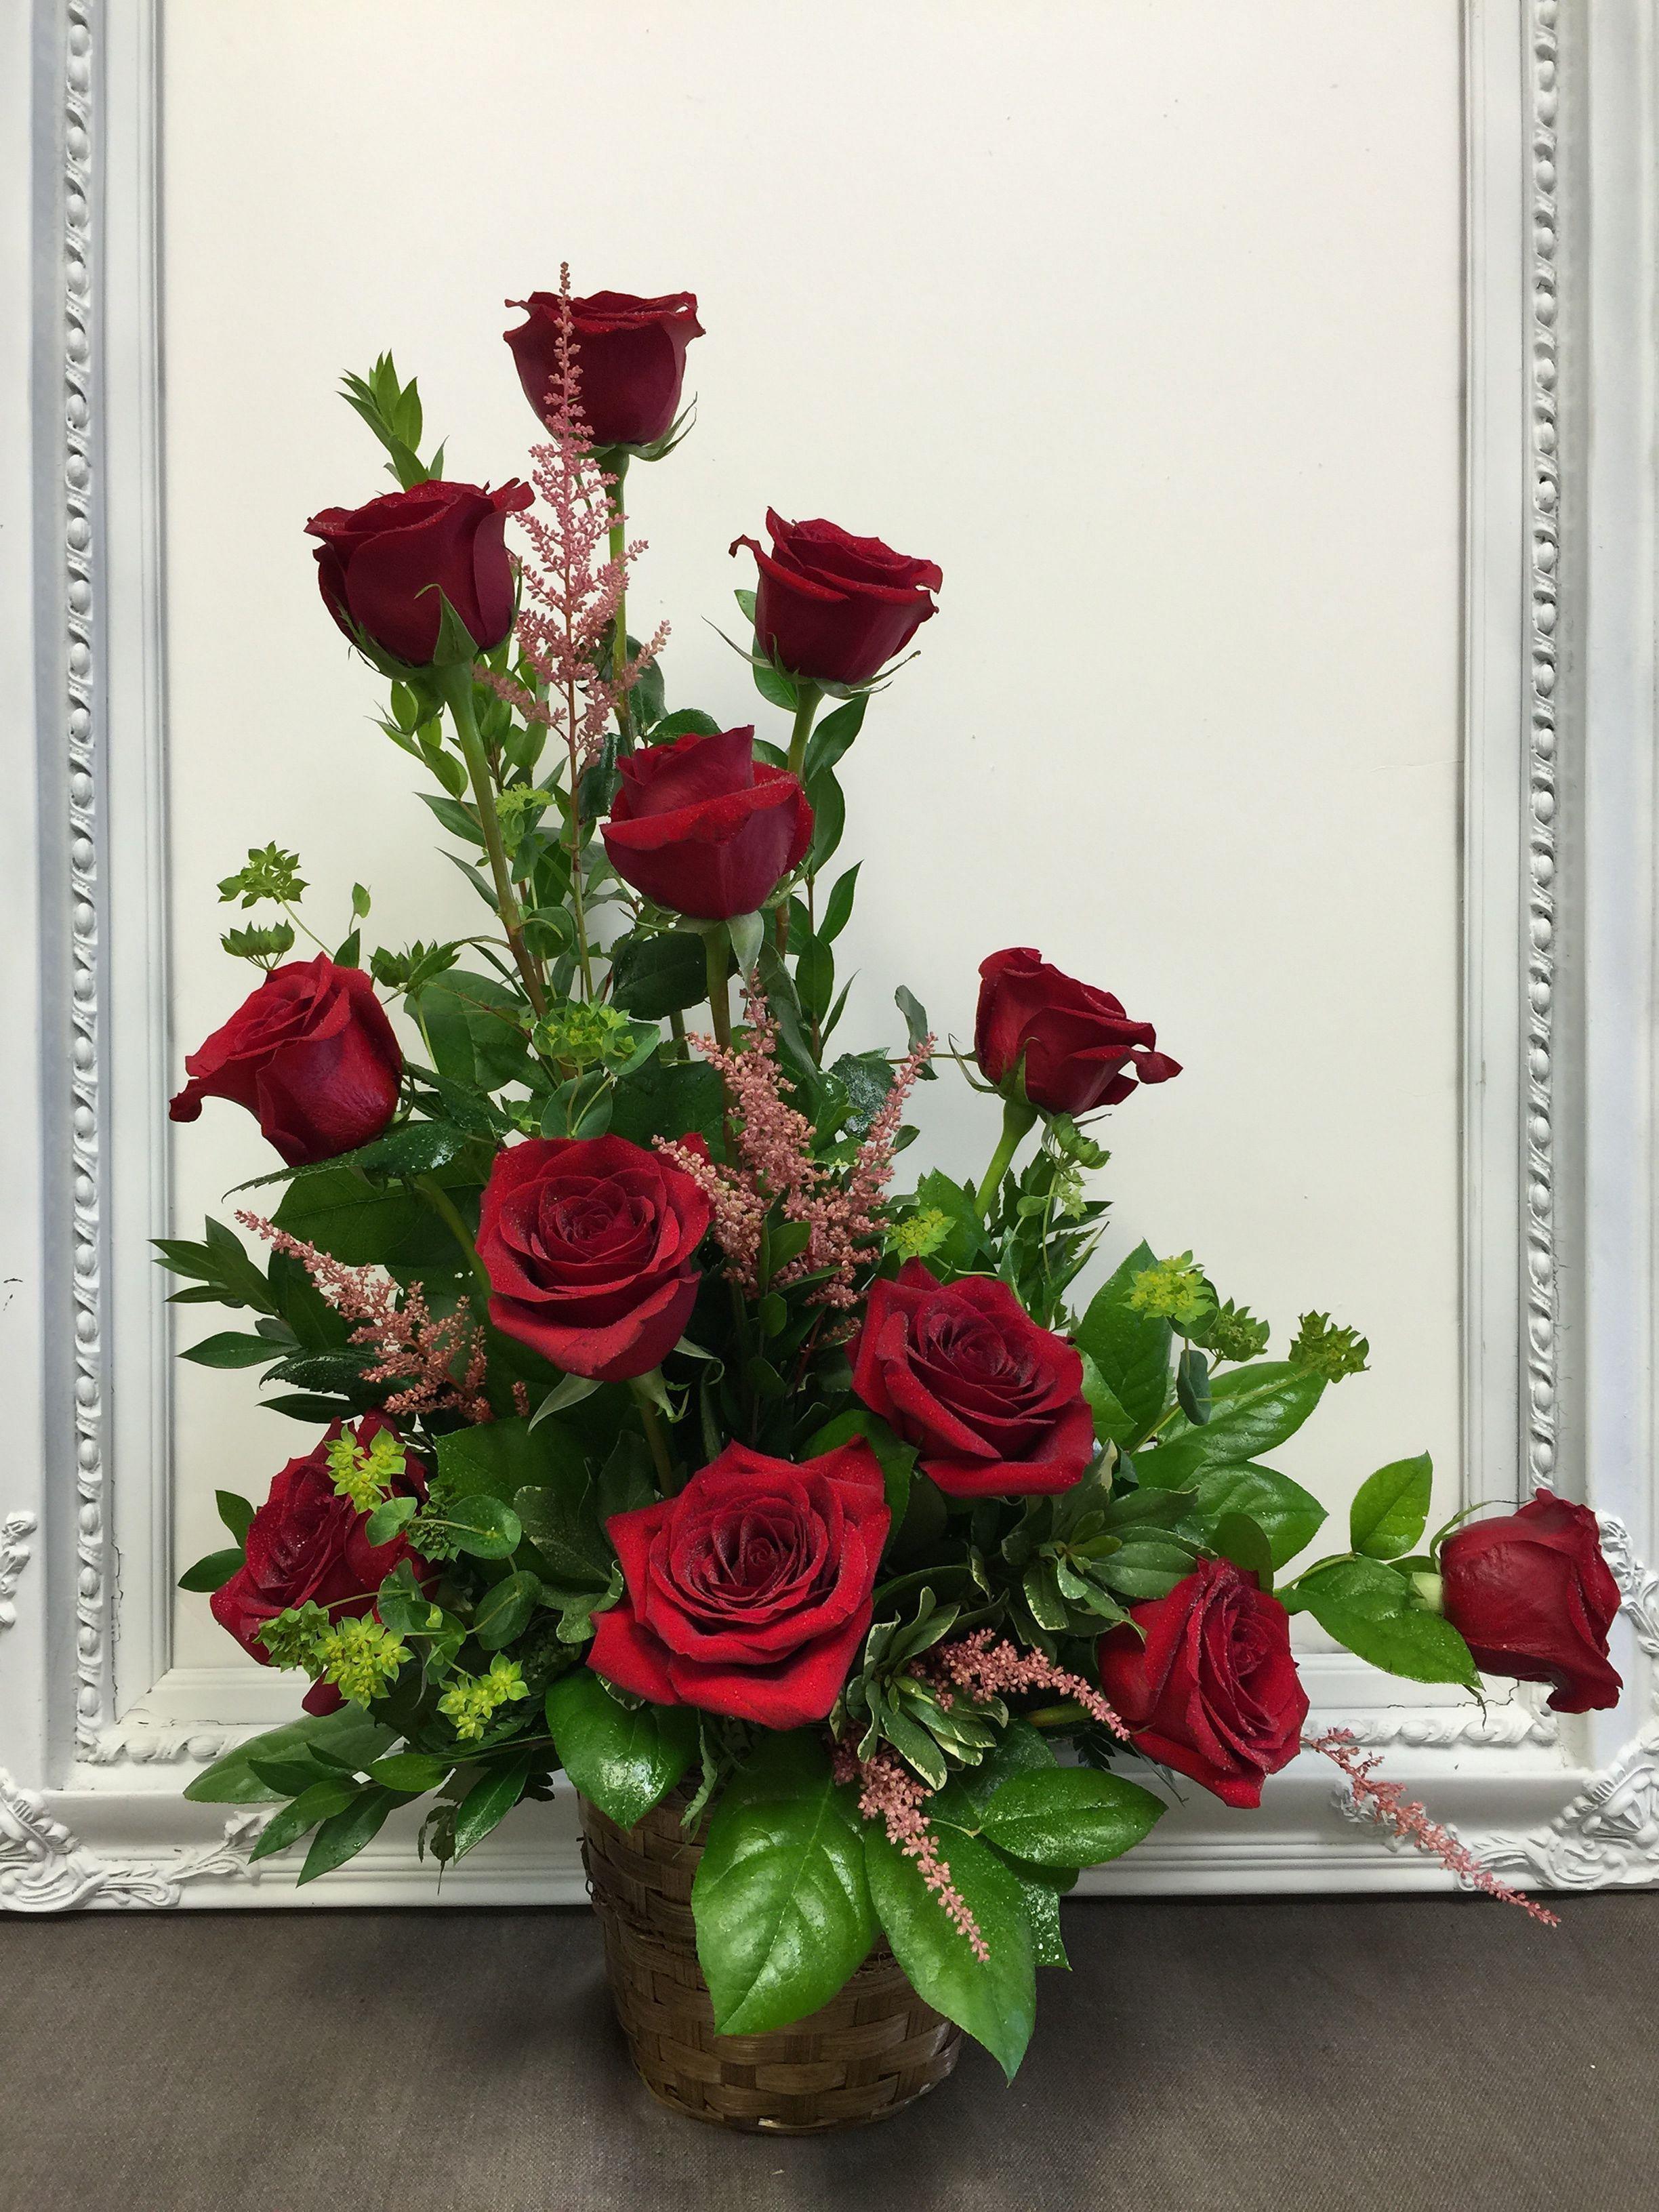 Beautiful valentine floral arrangements ideas 023 floral beautiful valentine floral arrangements ideas 023 decoor izmirmasajfo